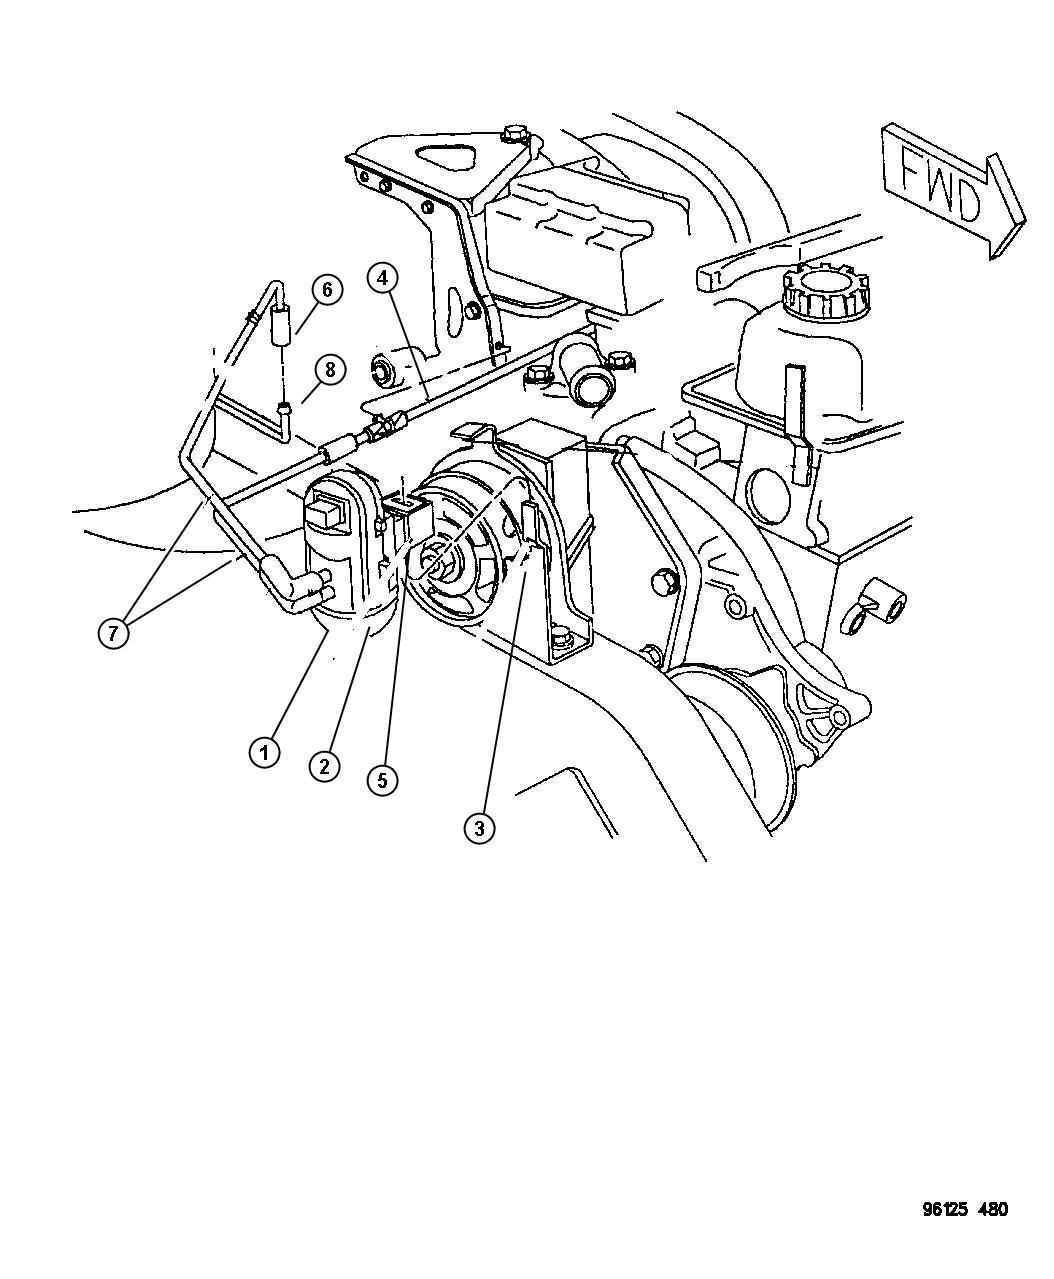 1997 Dodge Caravan Harness. Duty cycle purge solenoid